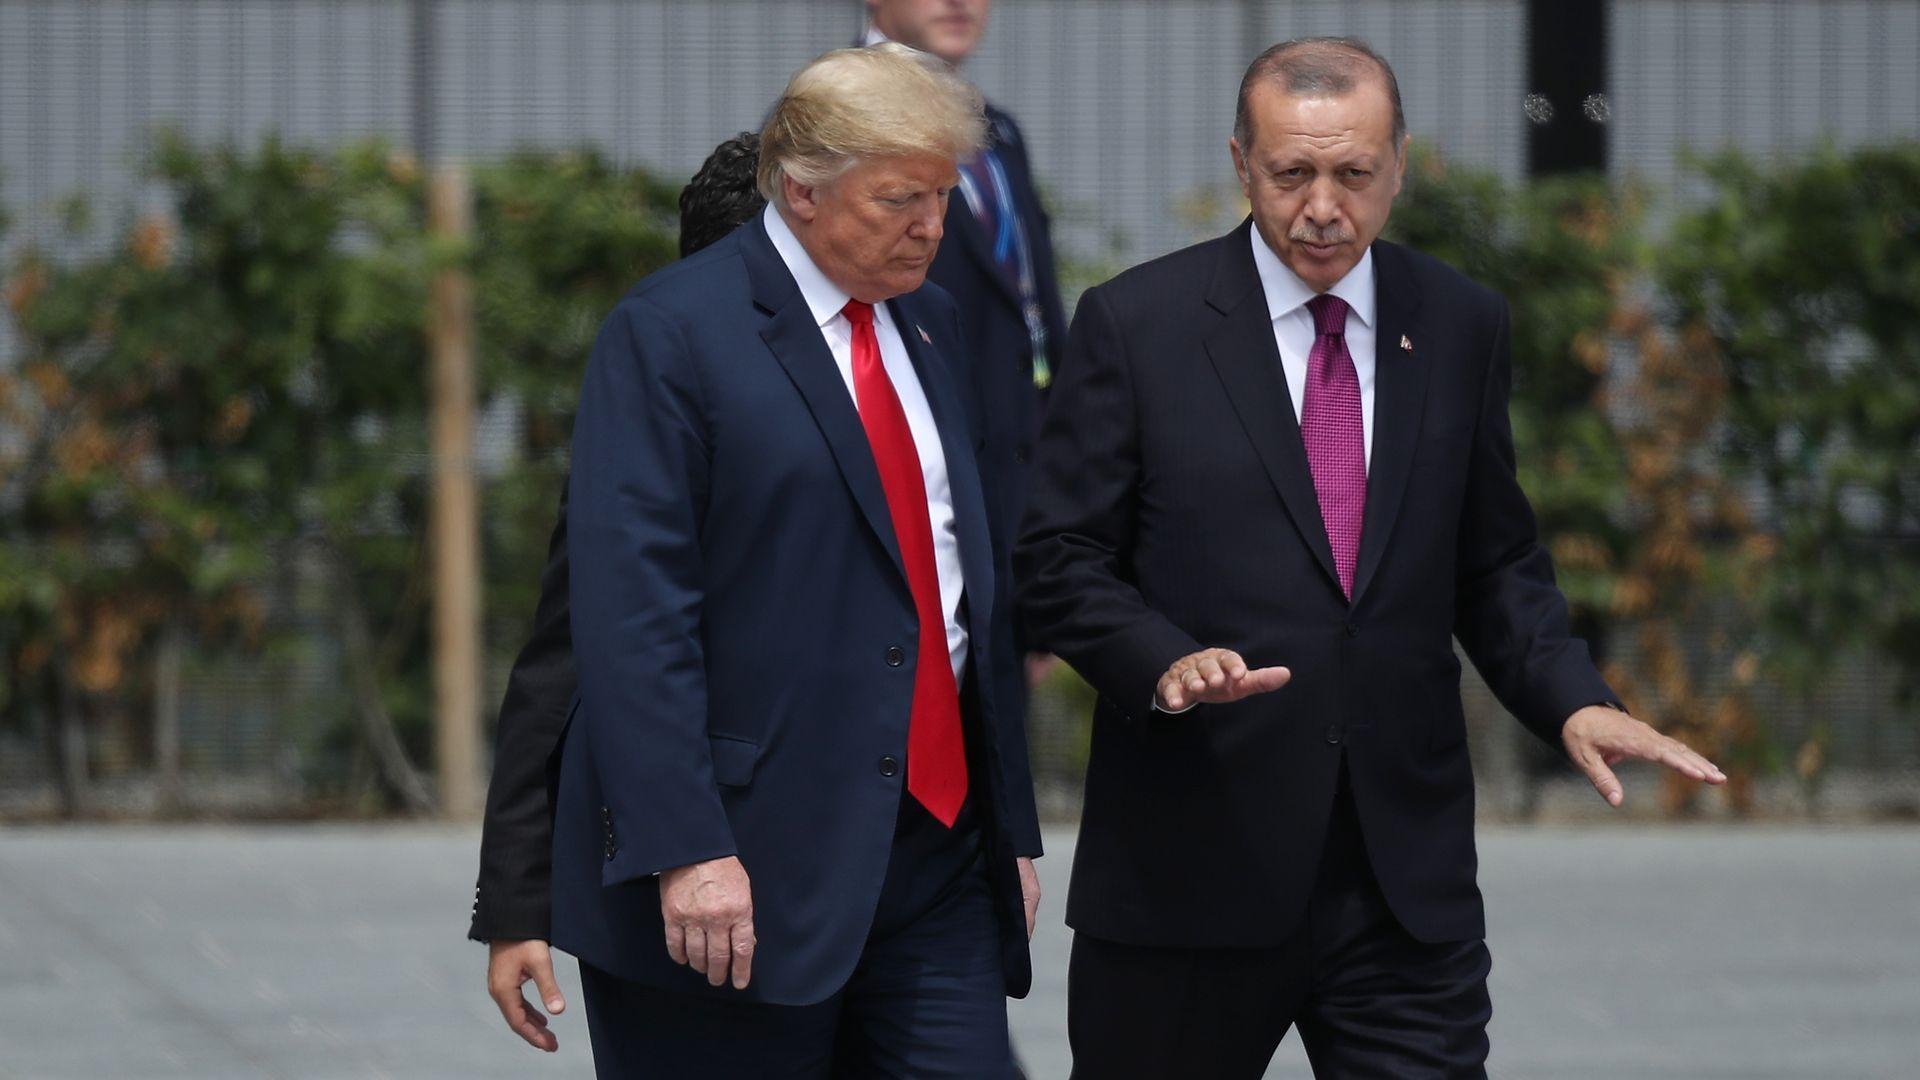 President Donald Trump (L) and Turkish President Recep Tayyip Erdogan